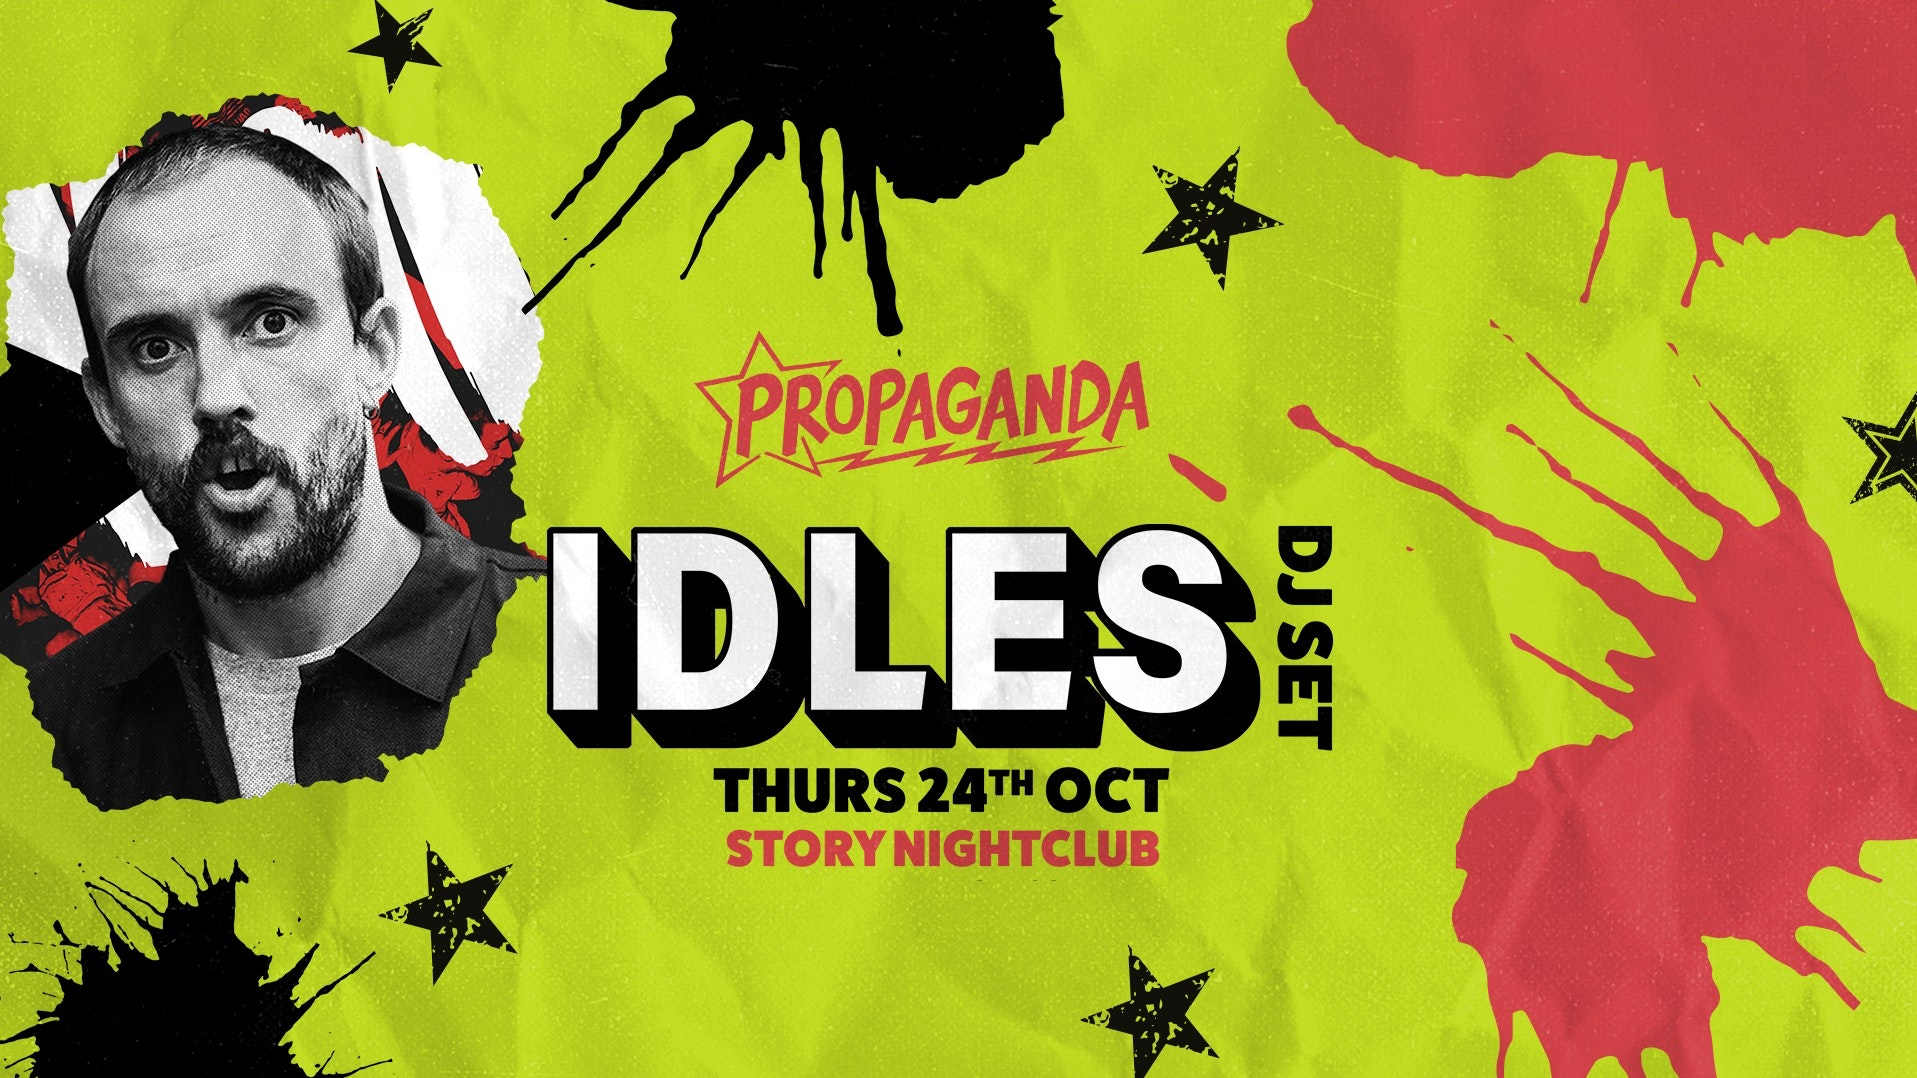 Propaganda Cardiff – Idles (DJ Set)!